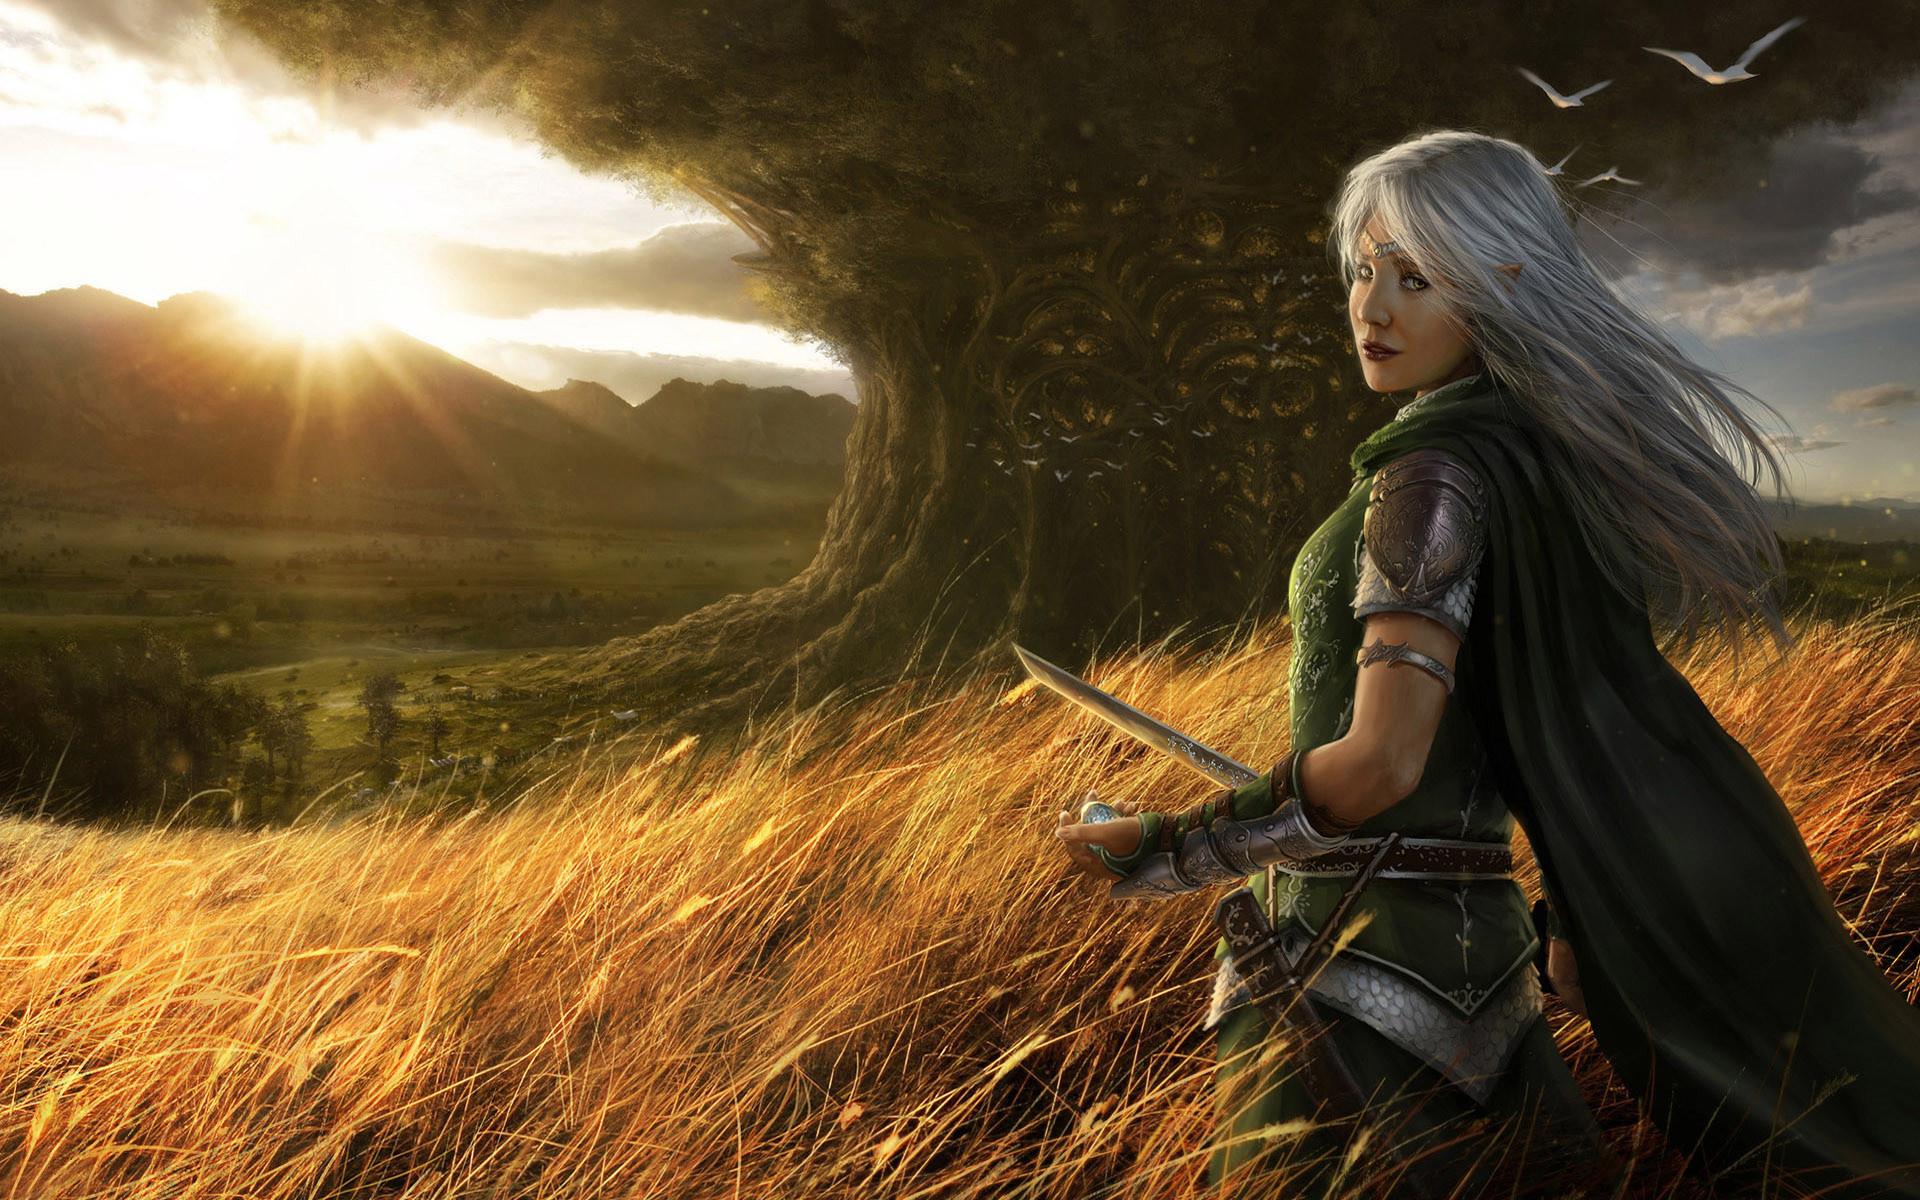 Fantasy Wallpaper Women HD Desktop | Back, woman, fantasy, wallpapers,  warrior (